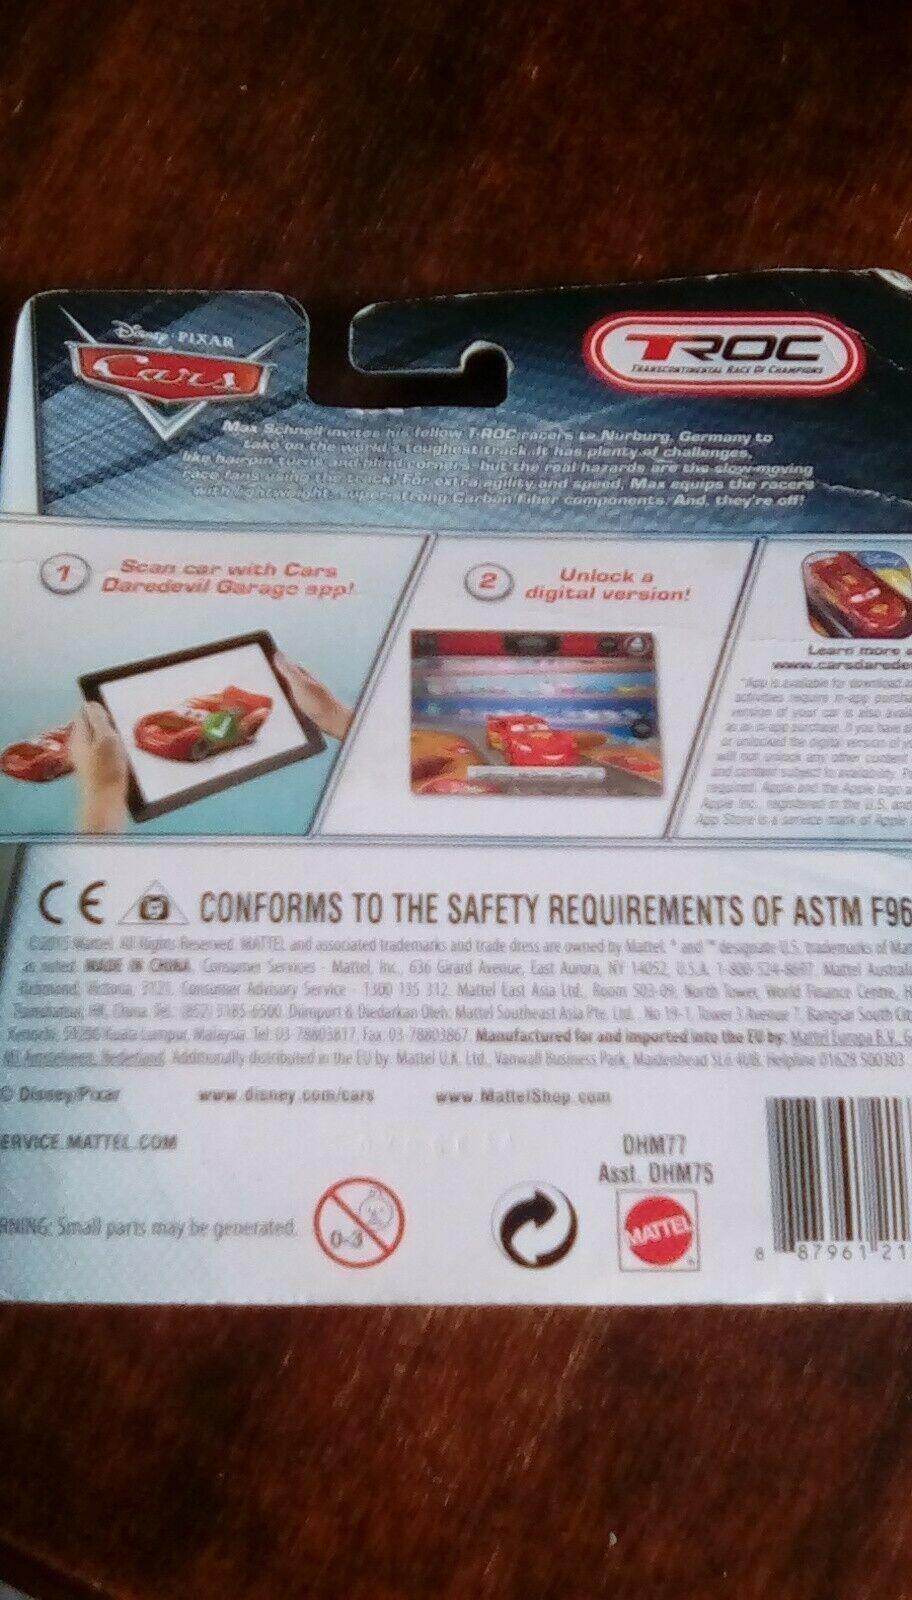 2015 disney/pixar MAC SCHNELL CAR cars mint condition